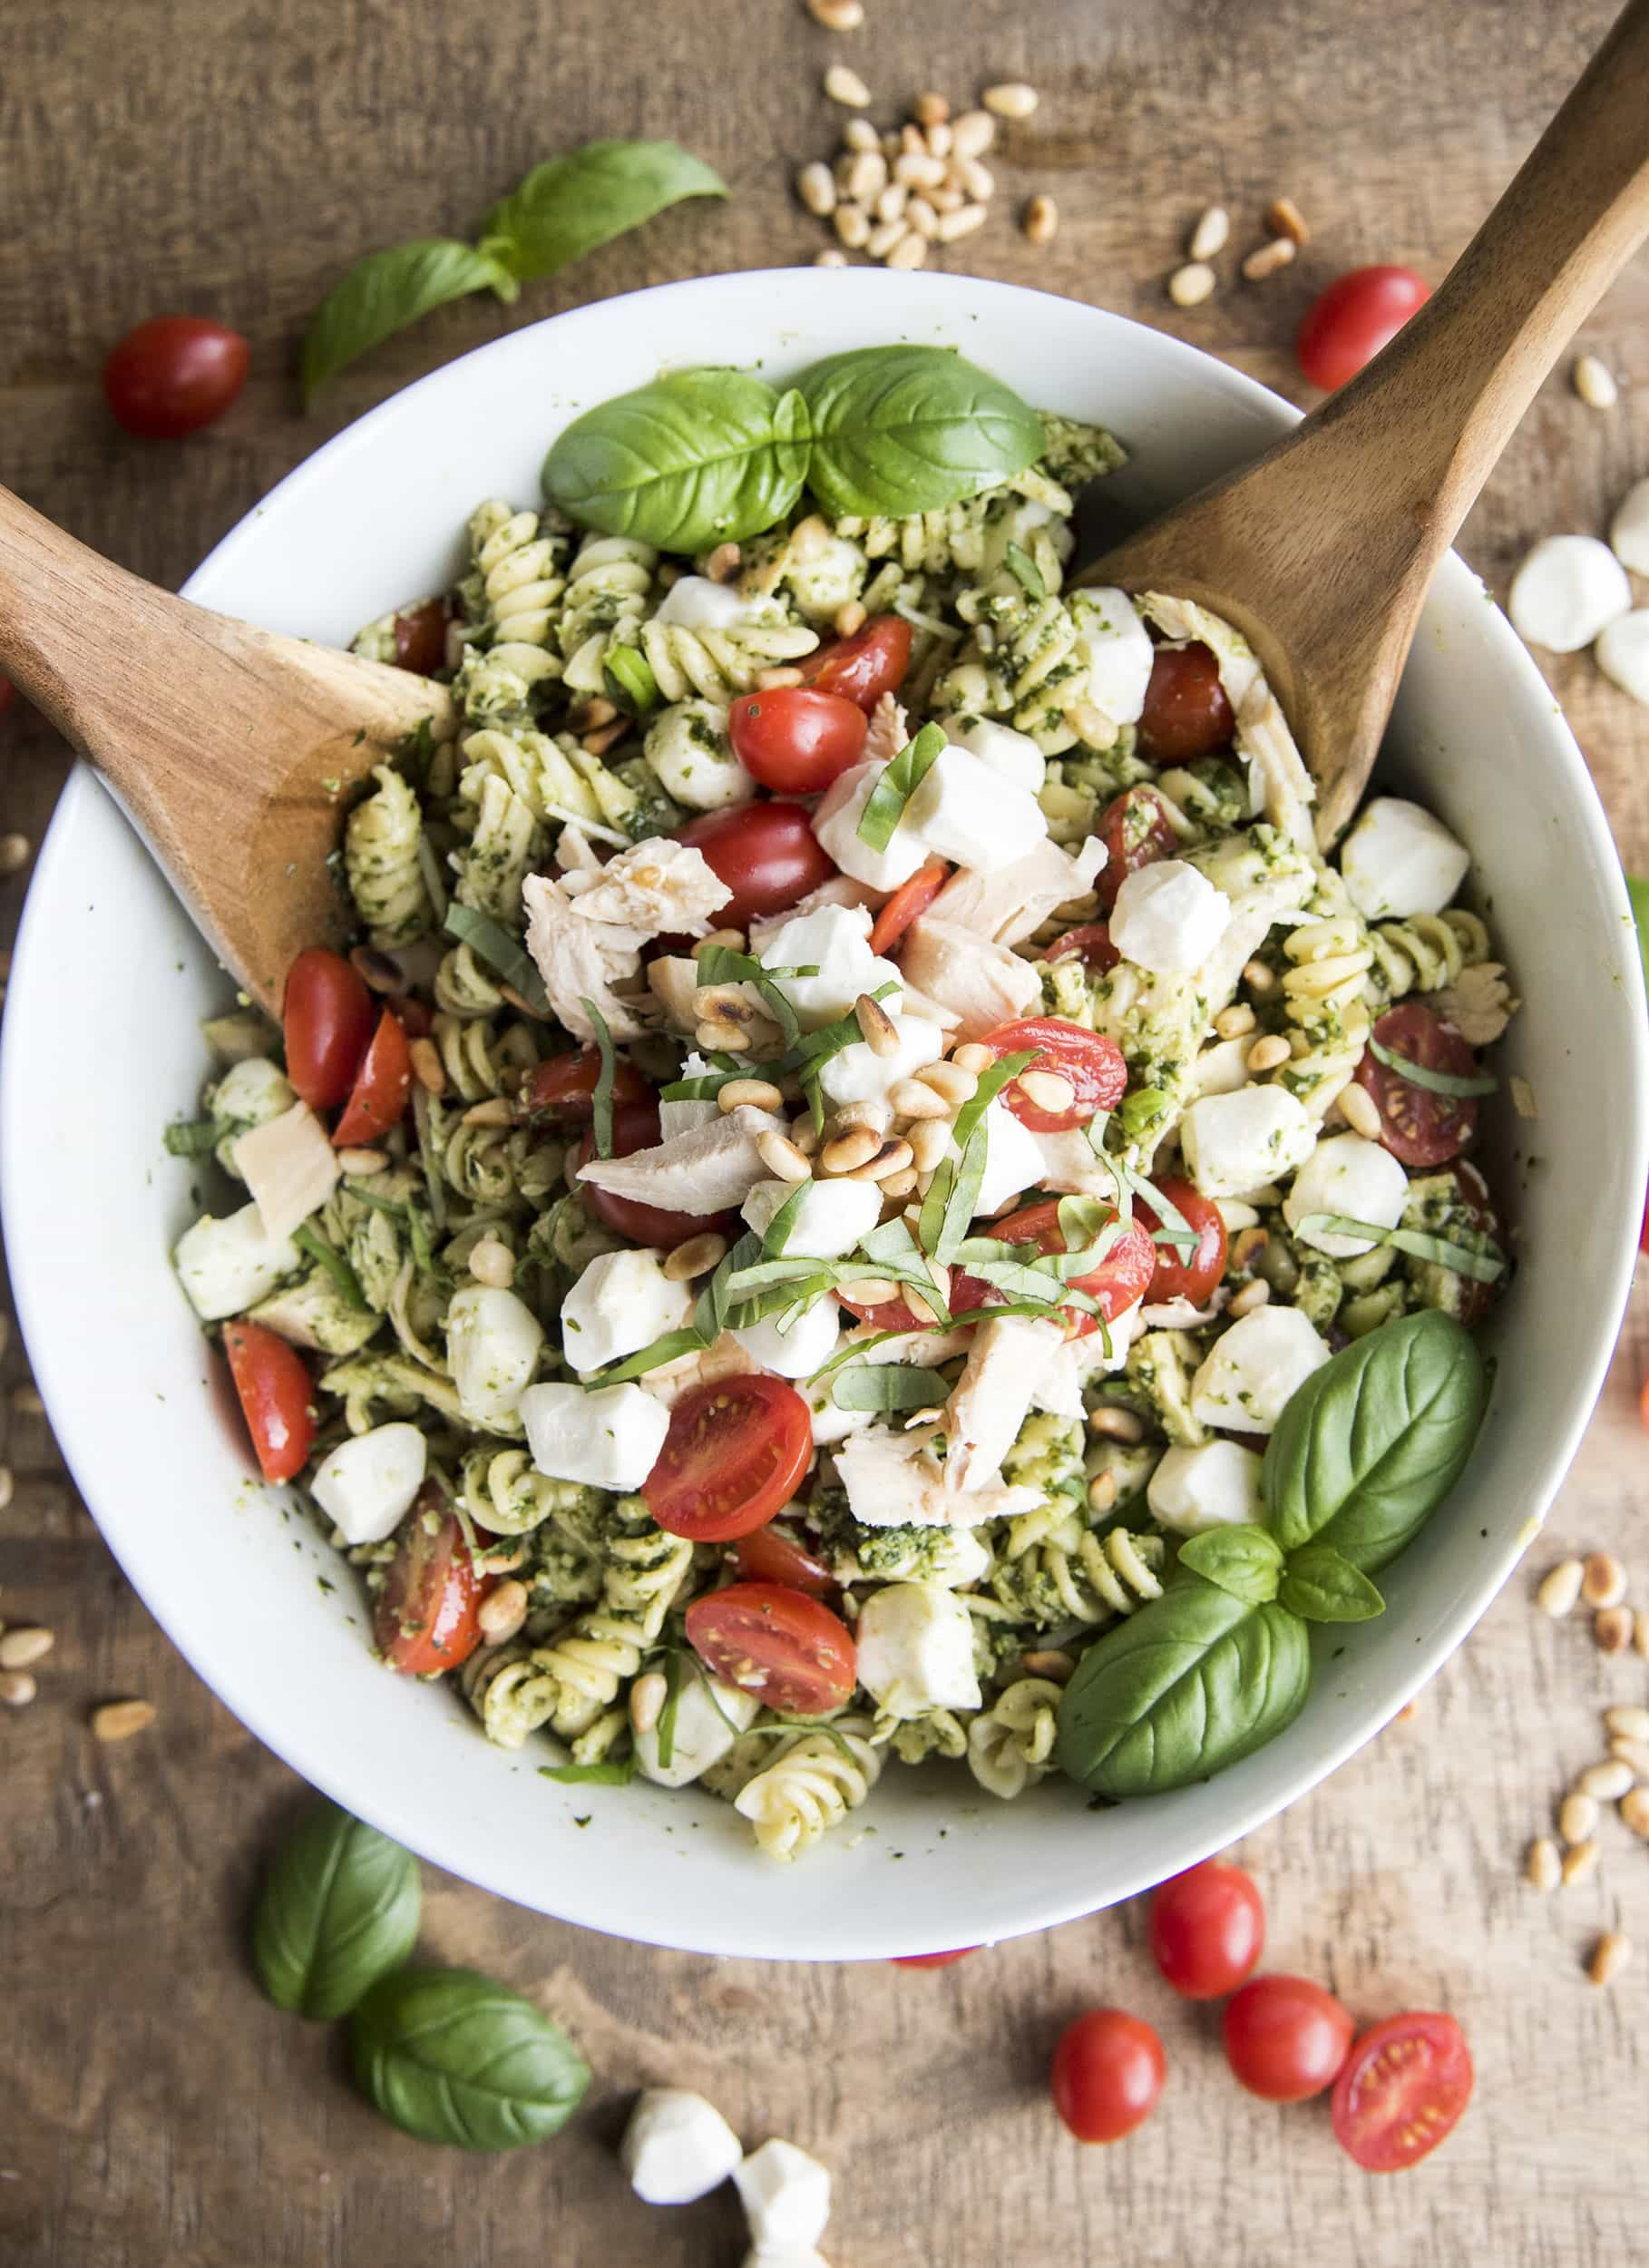 Cold Pesto Pasta Salad